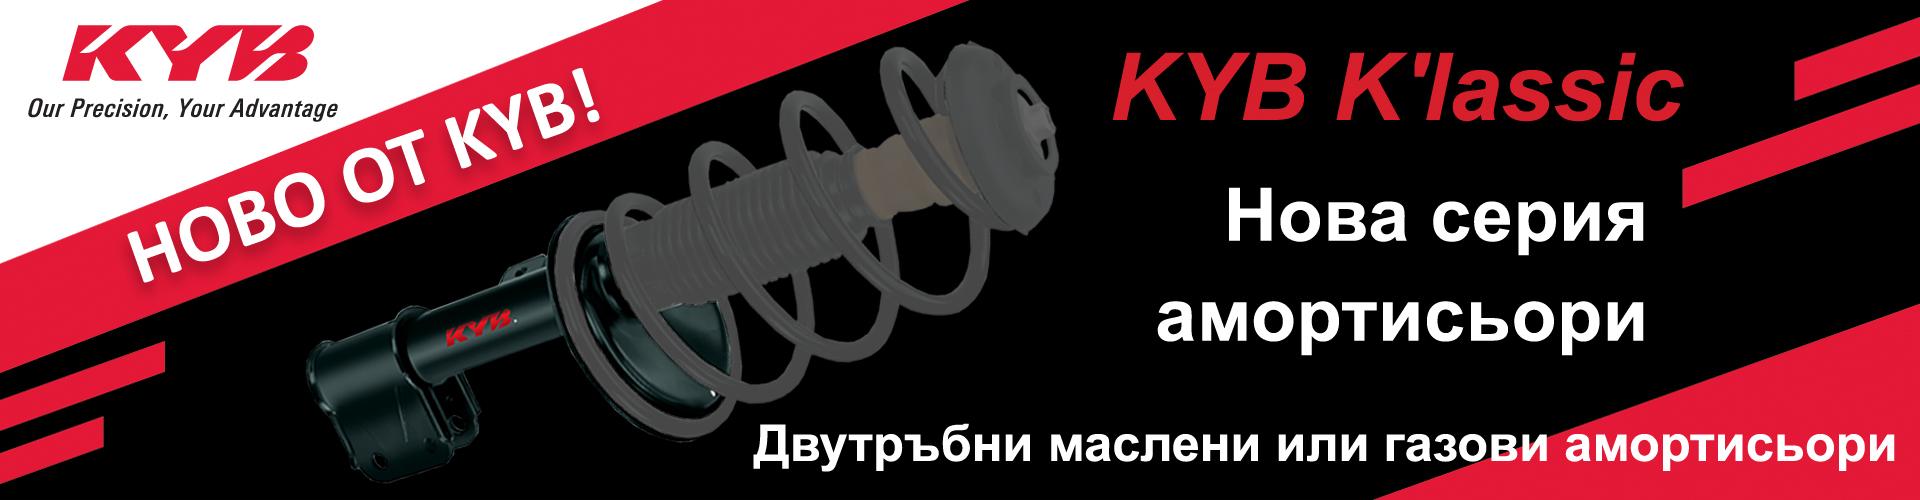 kayaba_klassic_banner.jpg